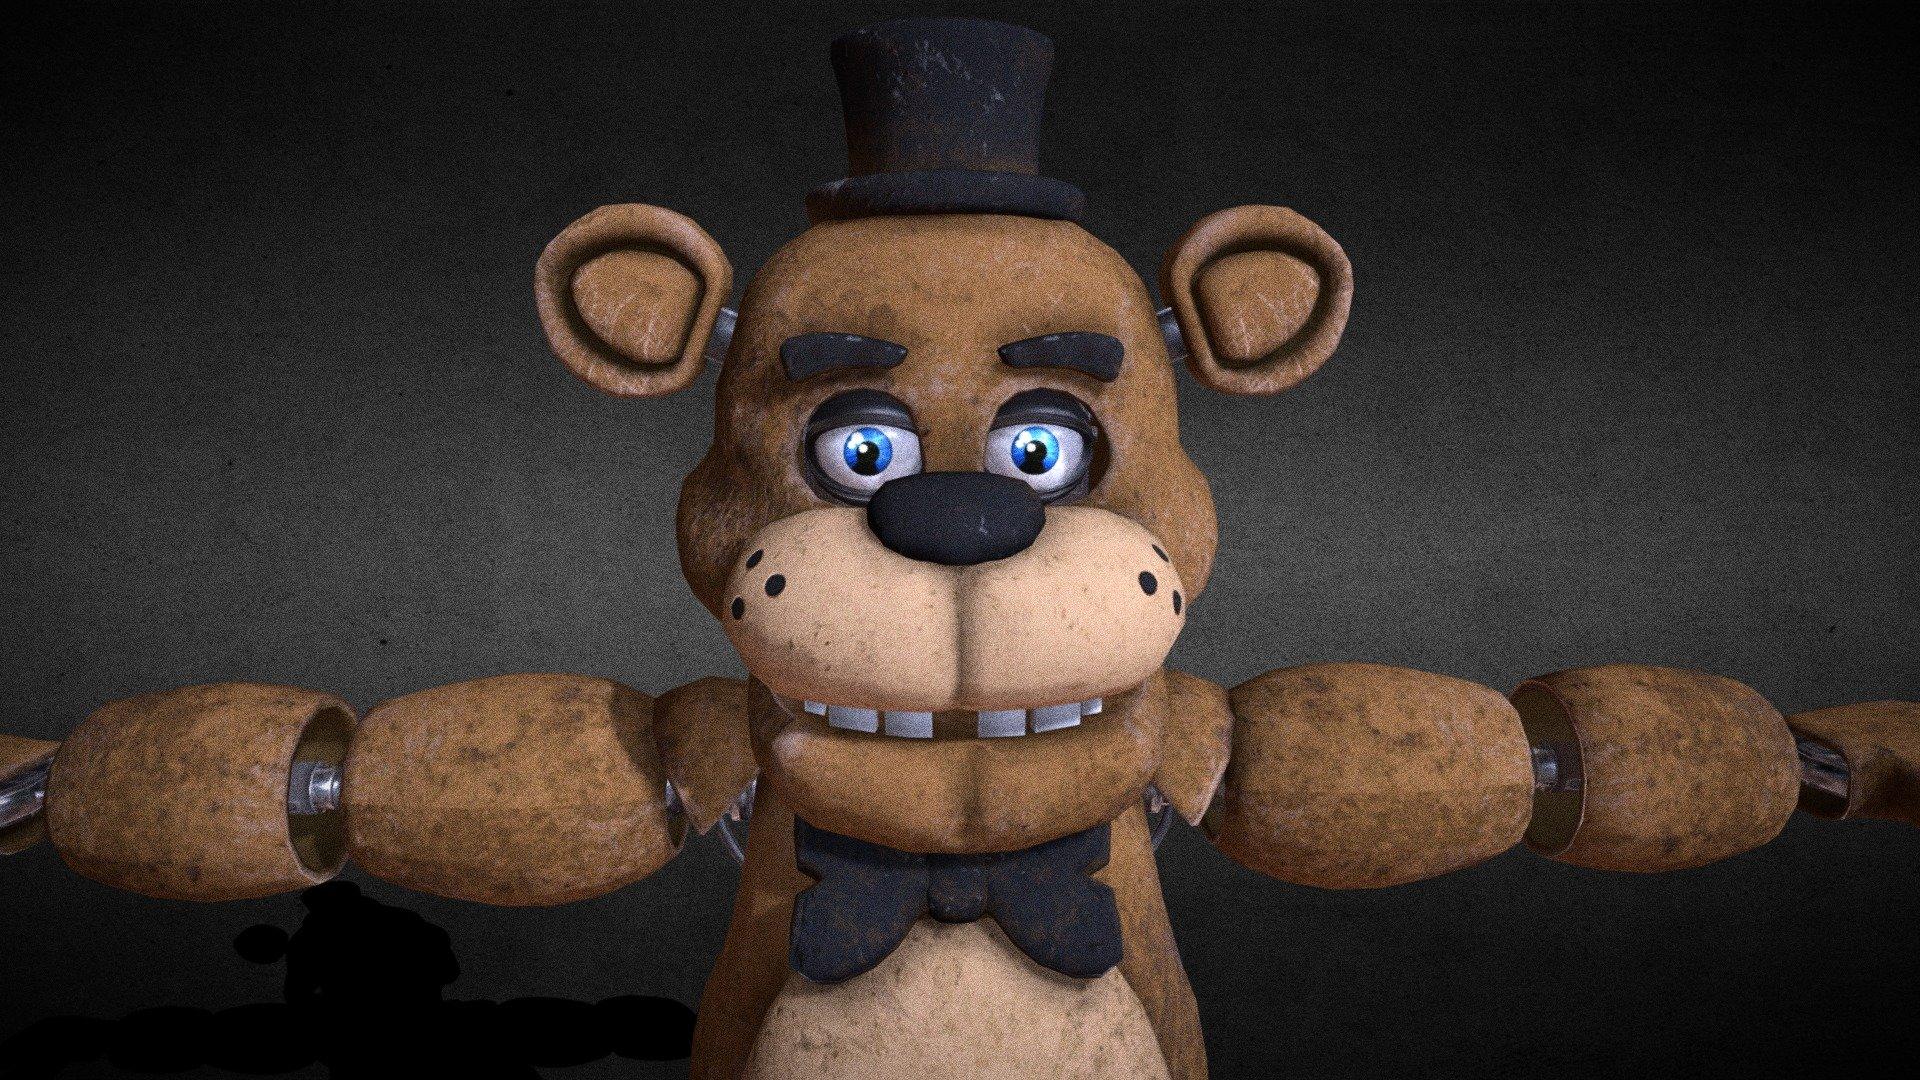 Freddy Fazbear from fnaf help wanted - Download Free 3D ...